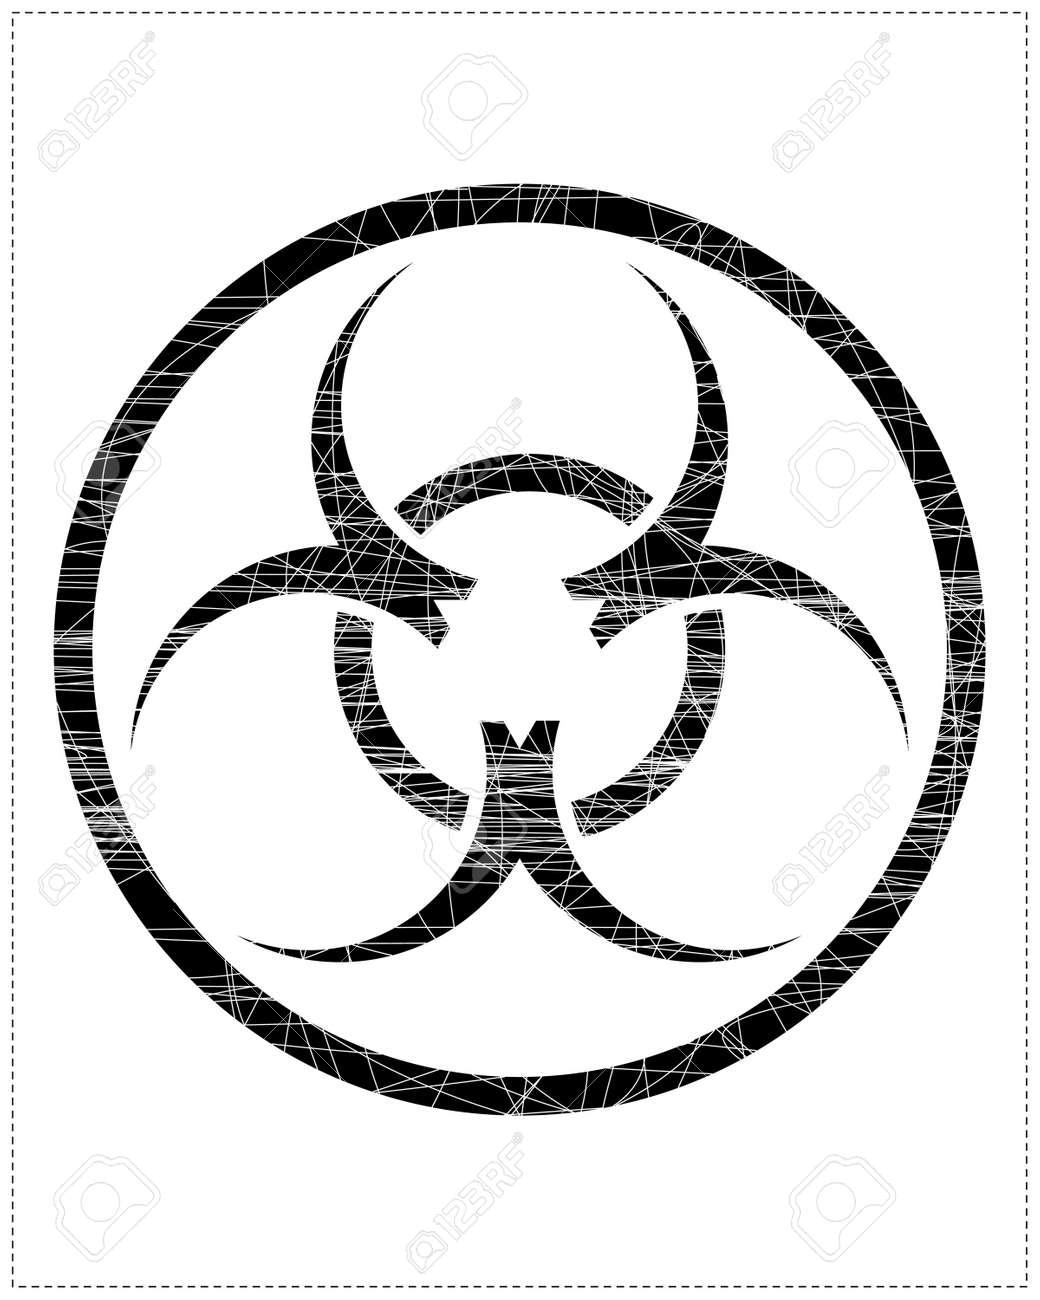 Black biohazard symbol Stock Vector - 20183971